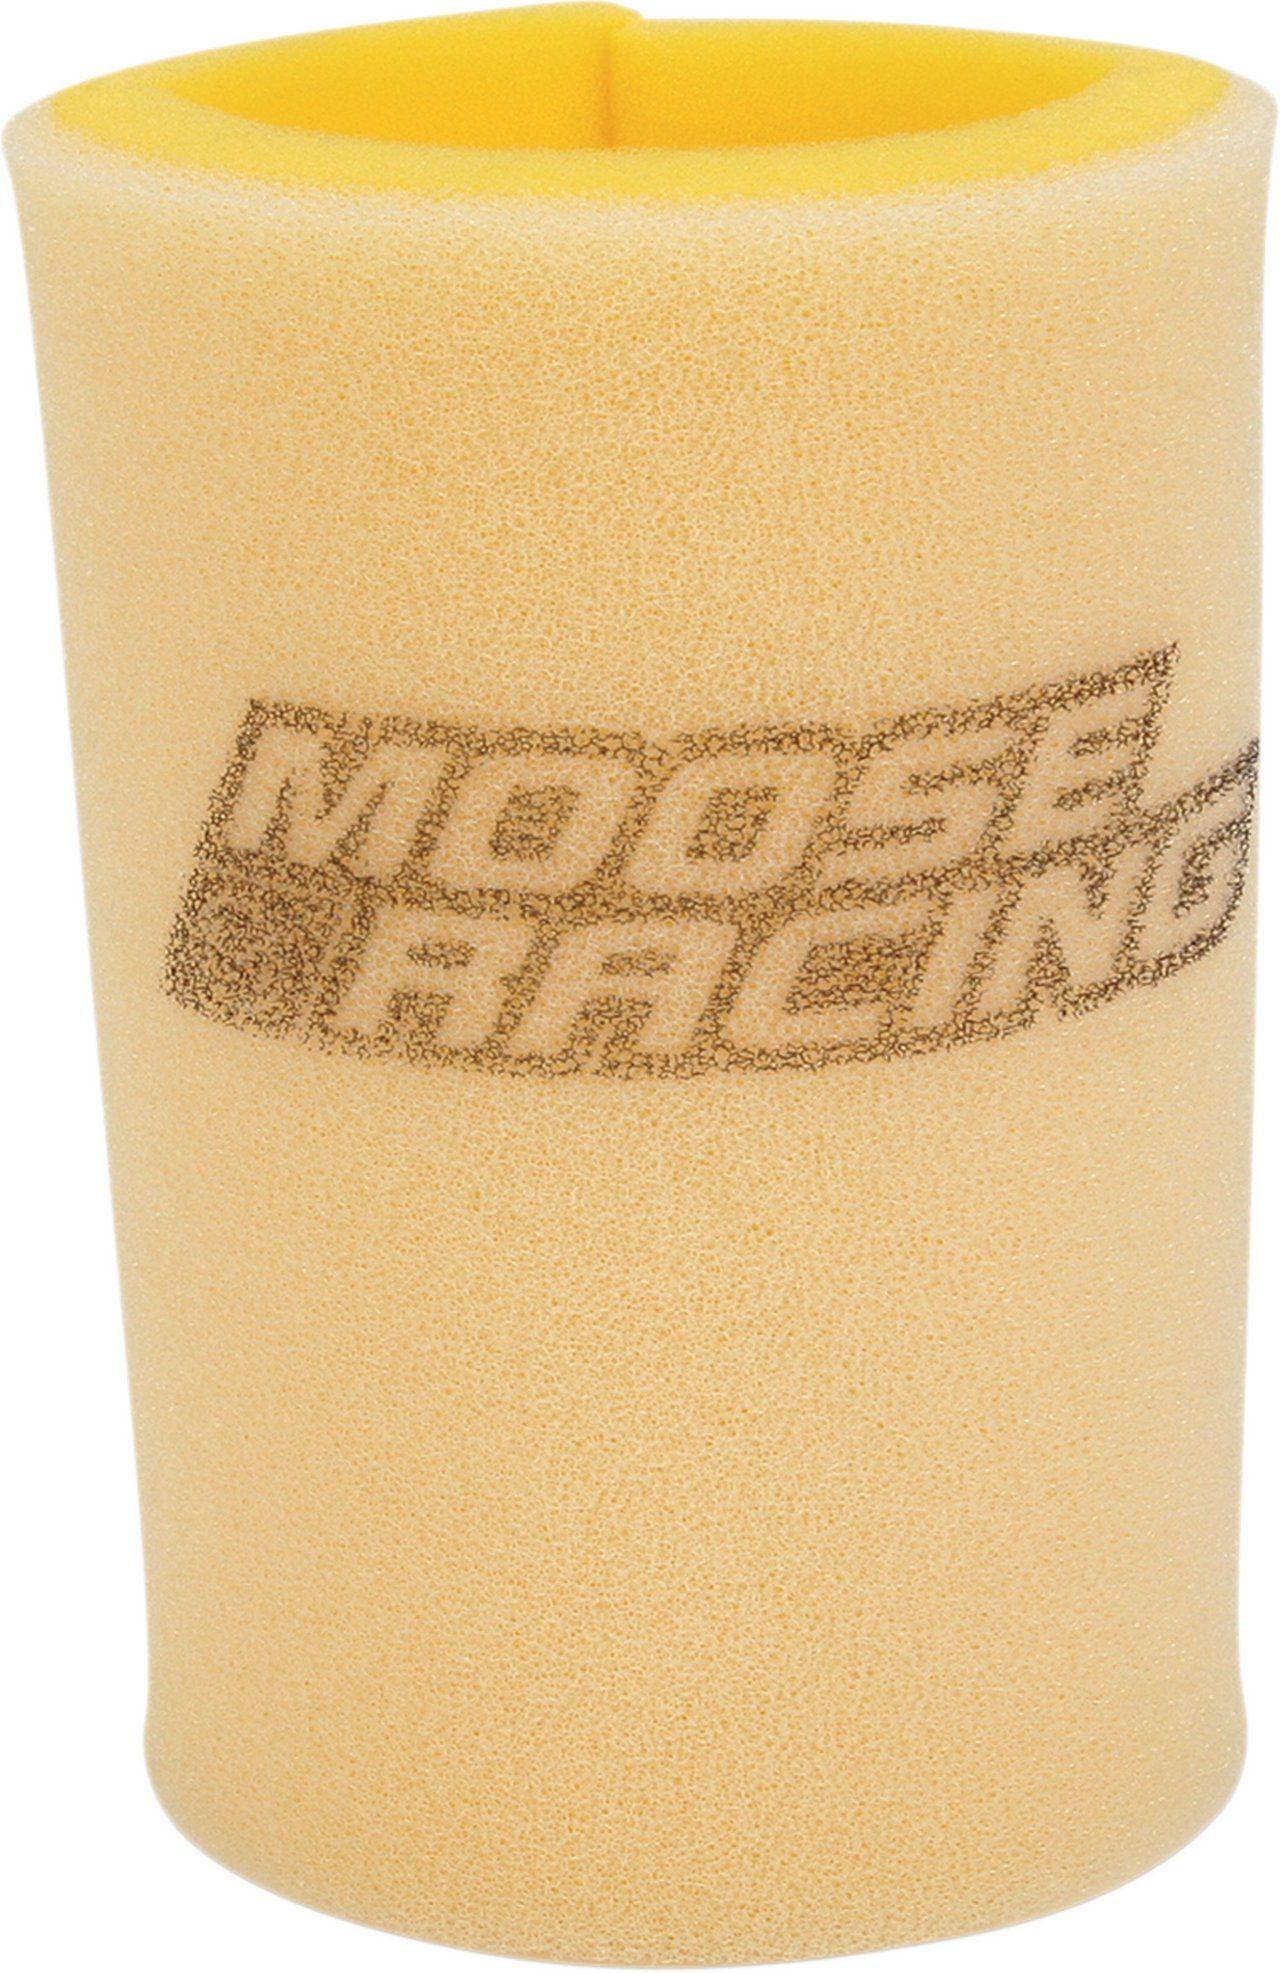 【MOOSE RACING】PPO (PRECISION PRE-OILED) 空氣濾芯 [1011-0980] - 「Webike-摩托百貨」